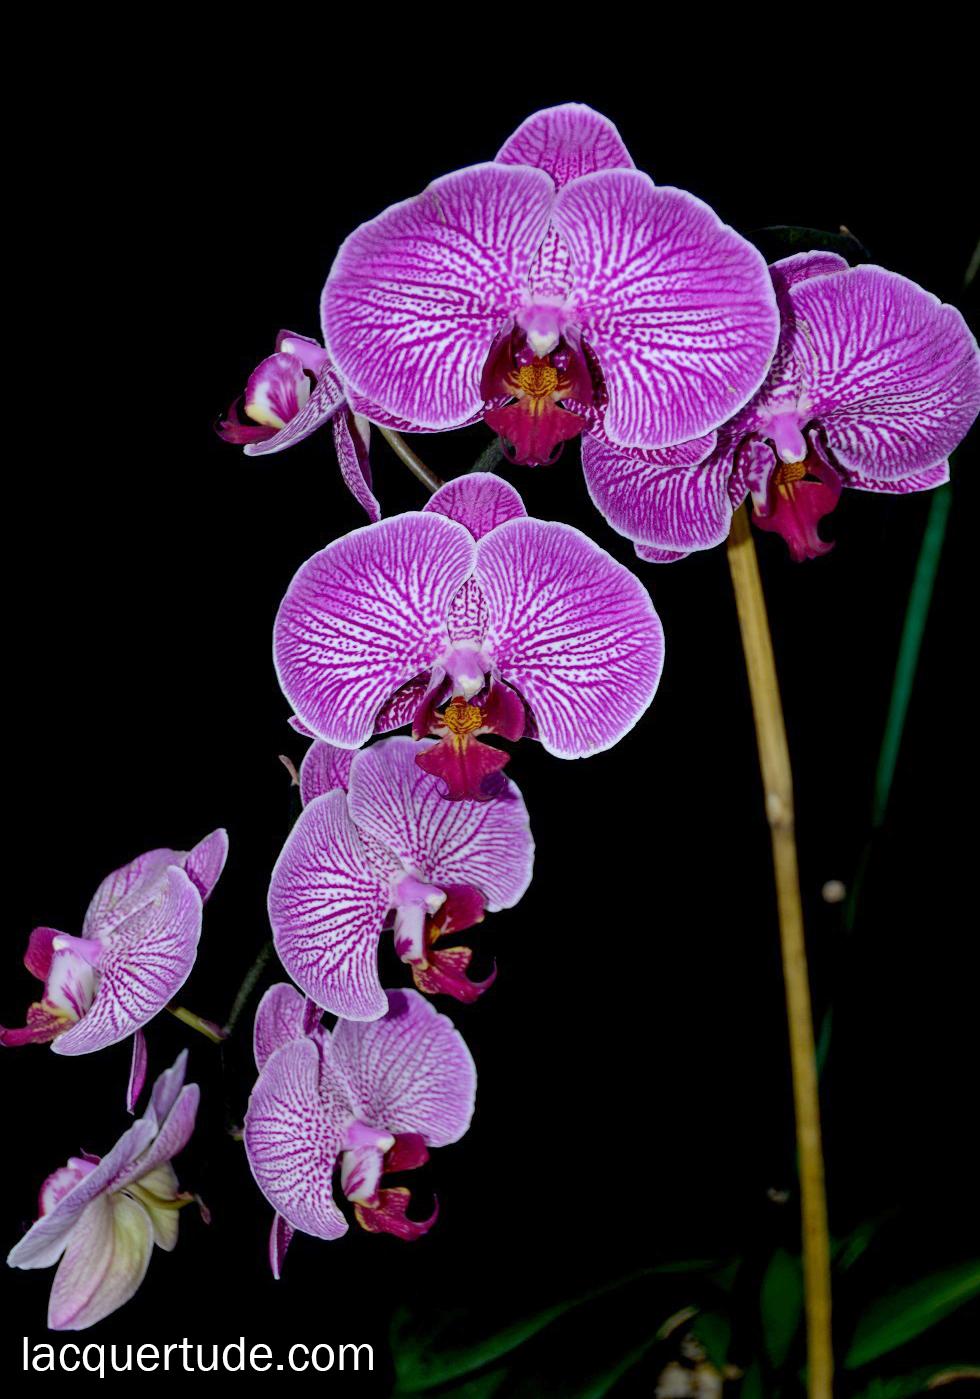 Lacquertude-Phalaenopsis-Radiant-Orchid1